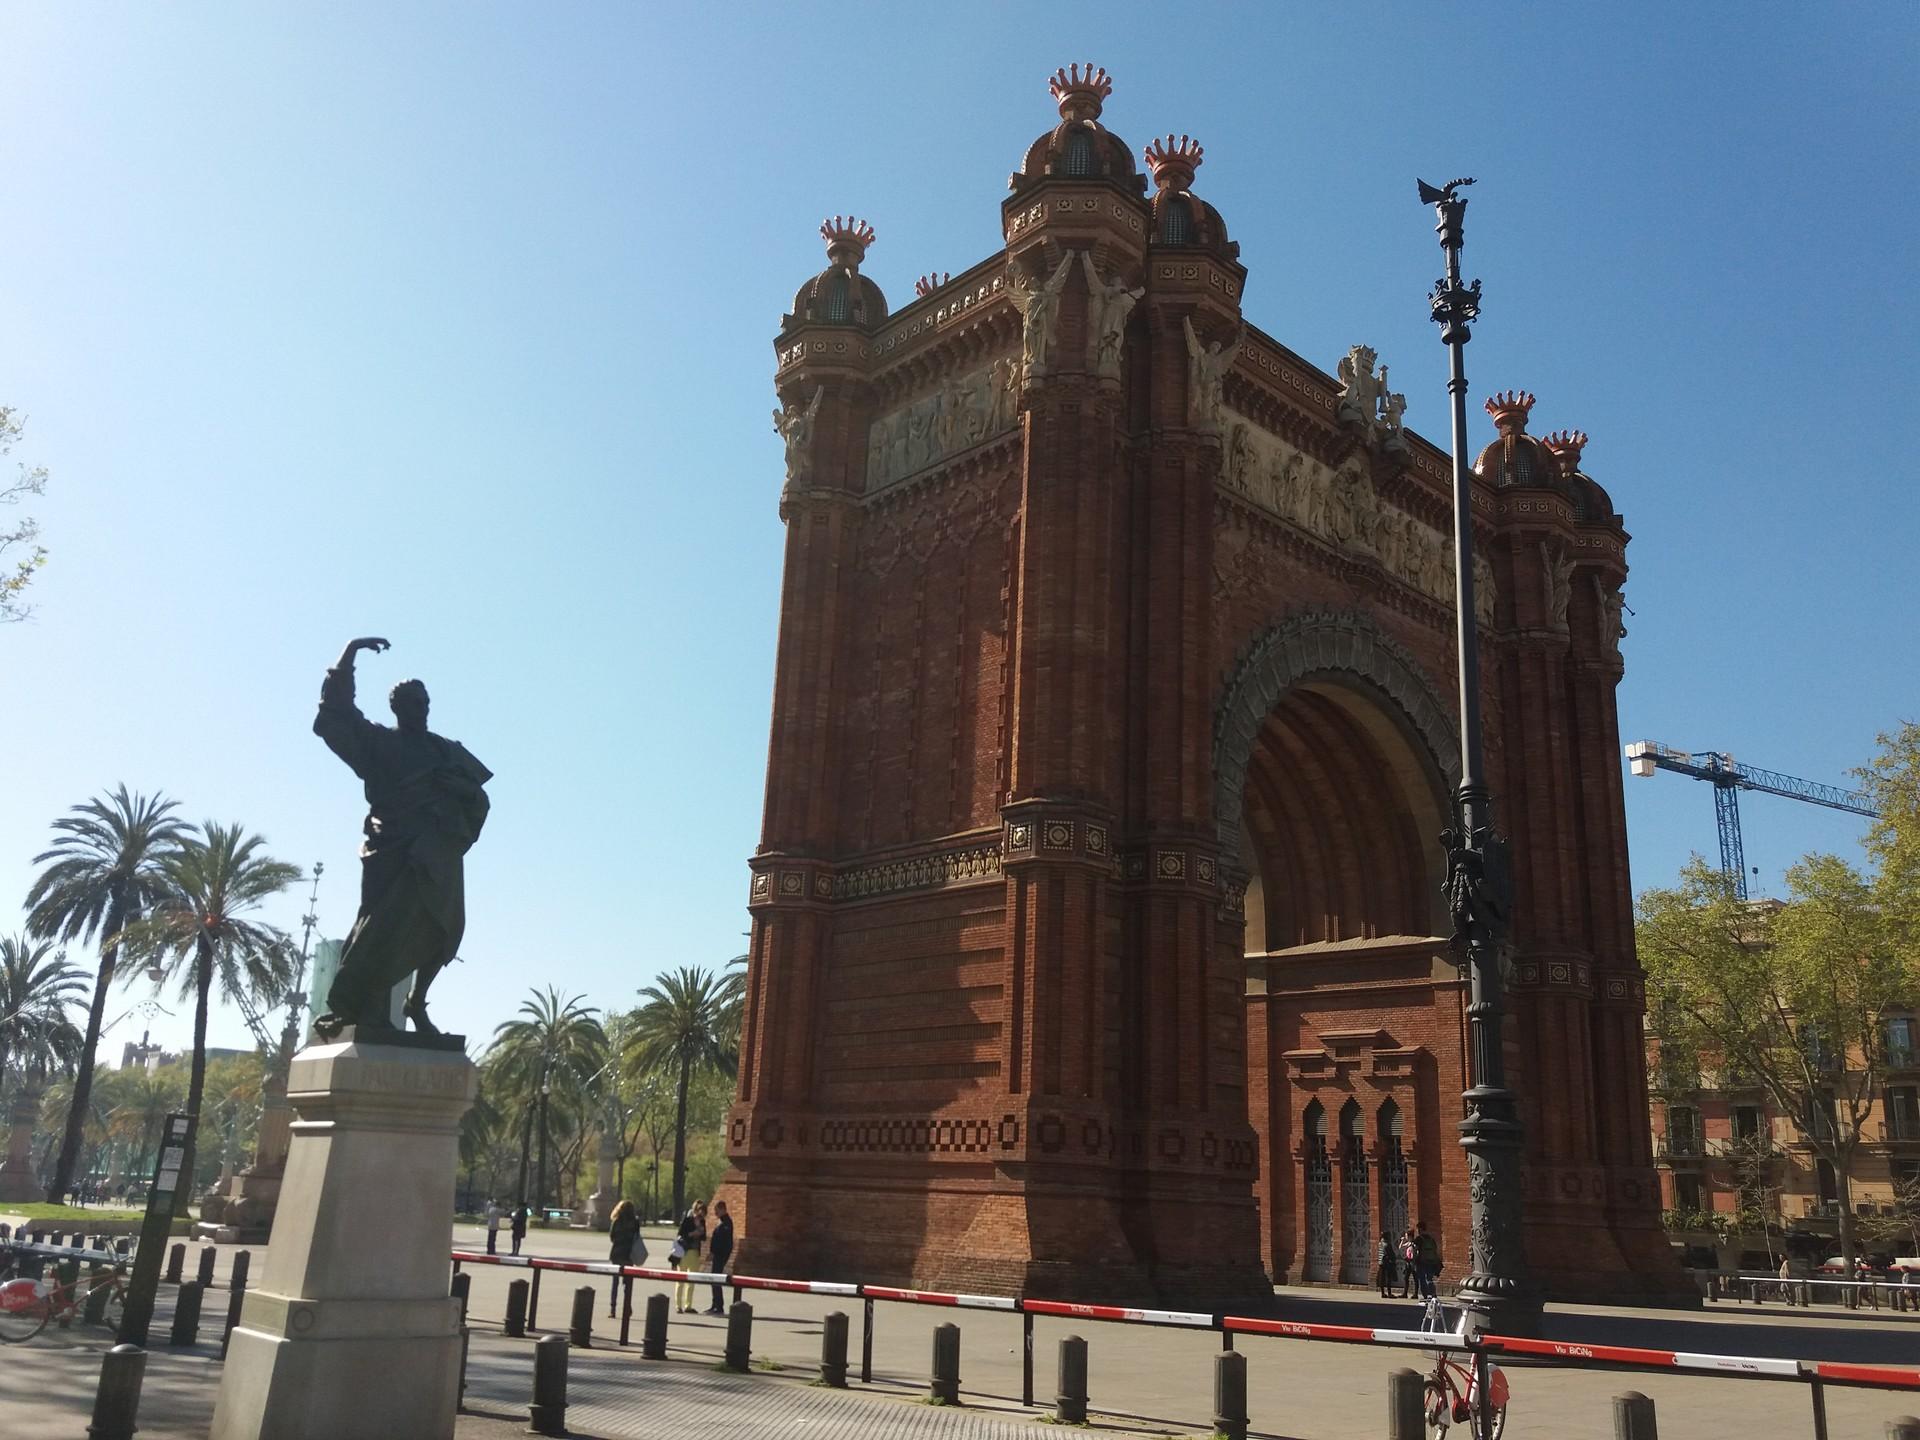 get-lost-barcelona-impressions-85dcf553d